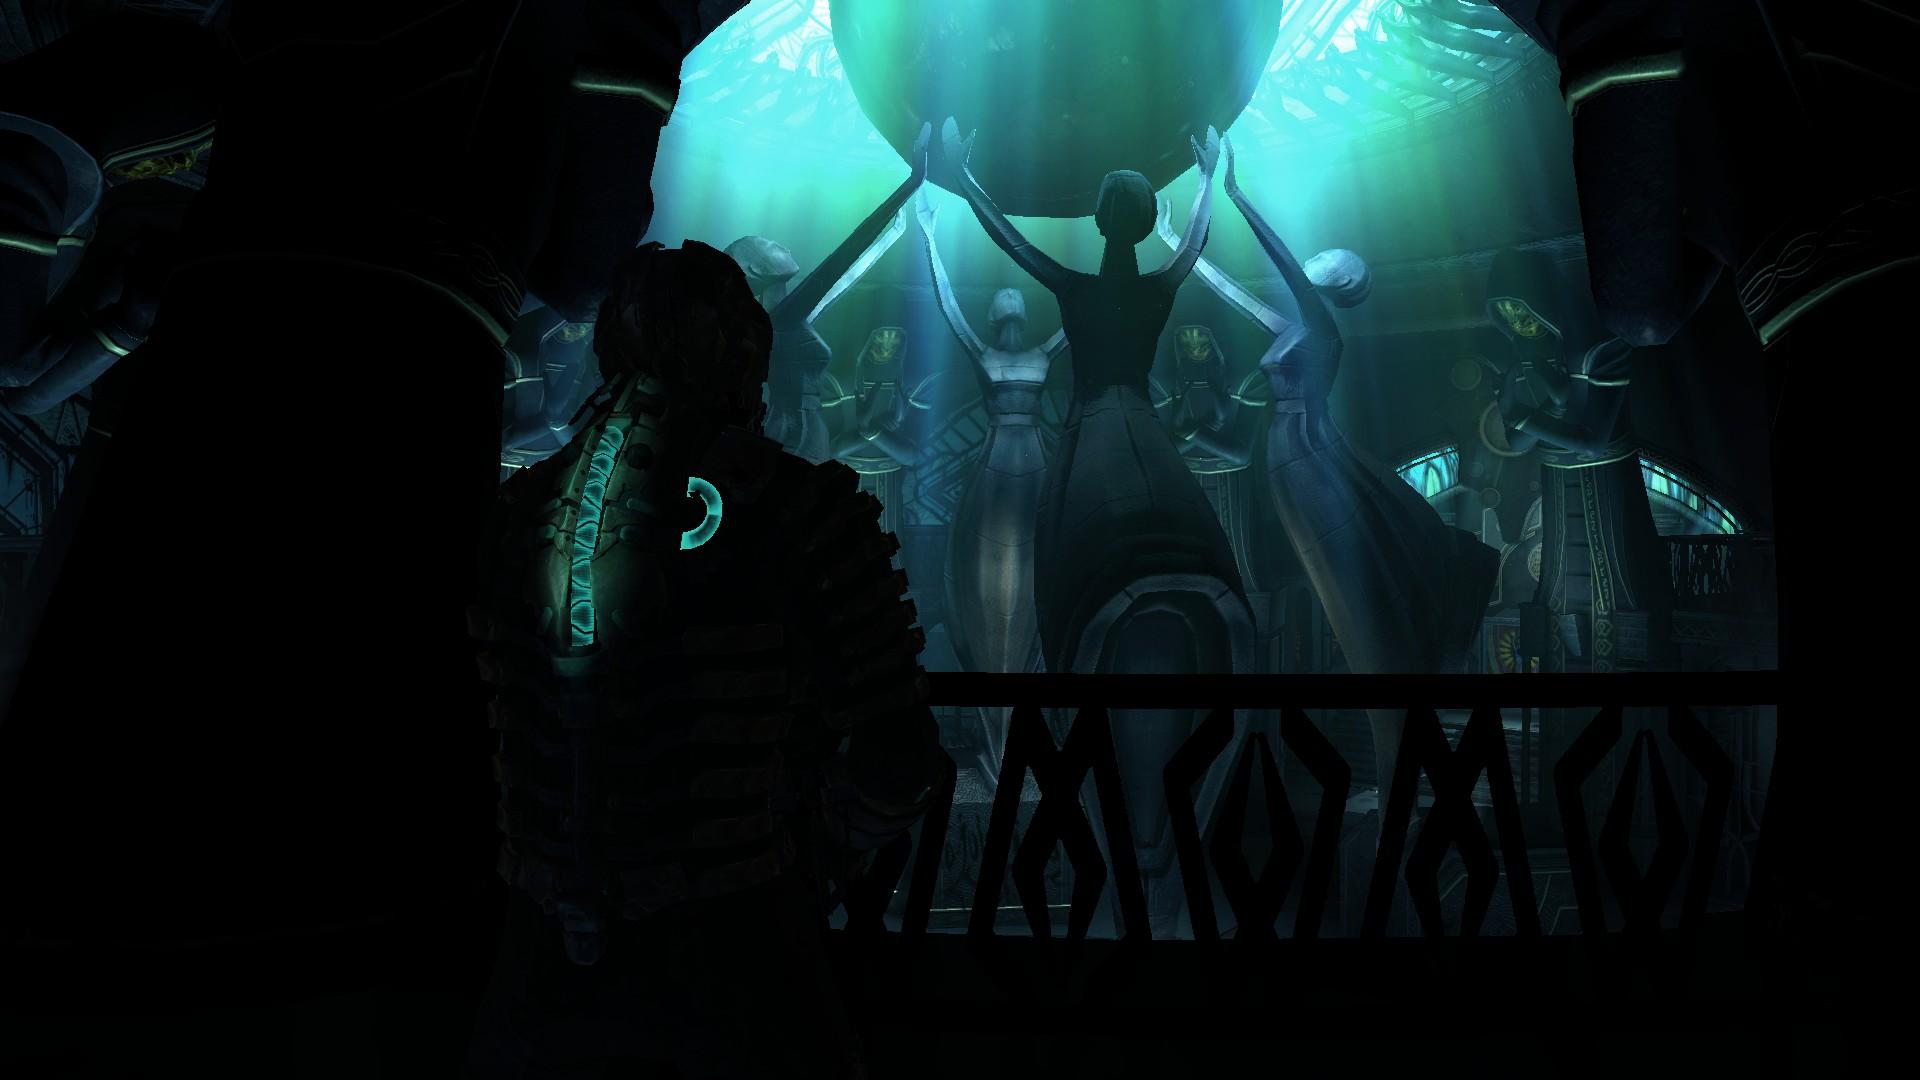 Speciál o herní sérii Dead Space 13976